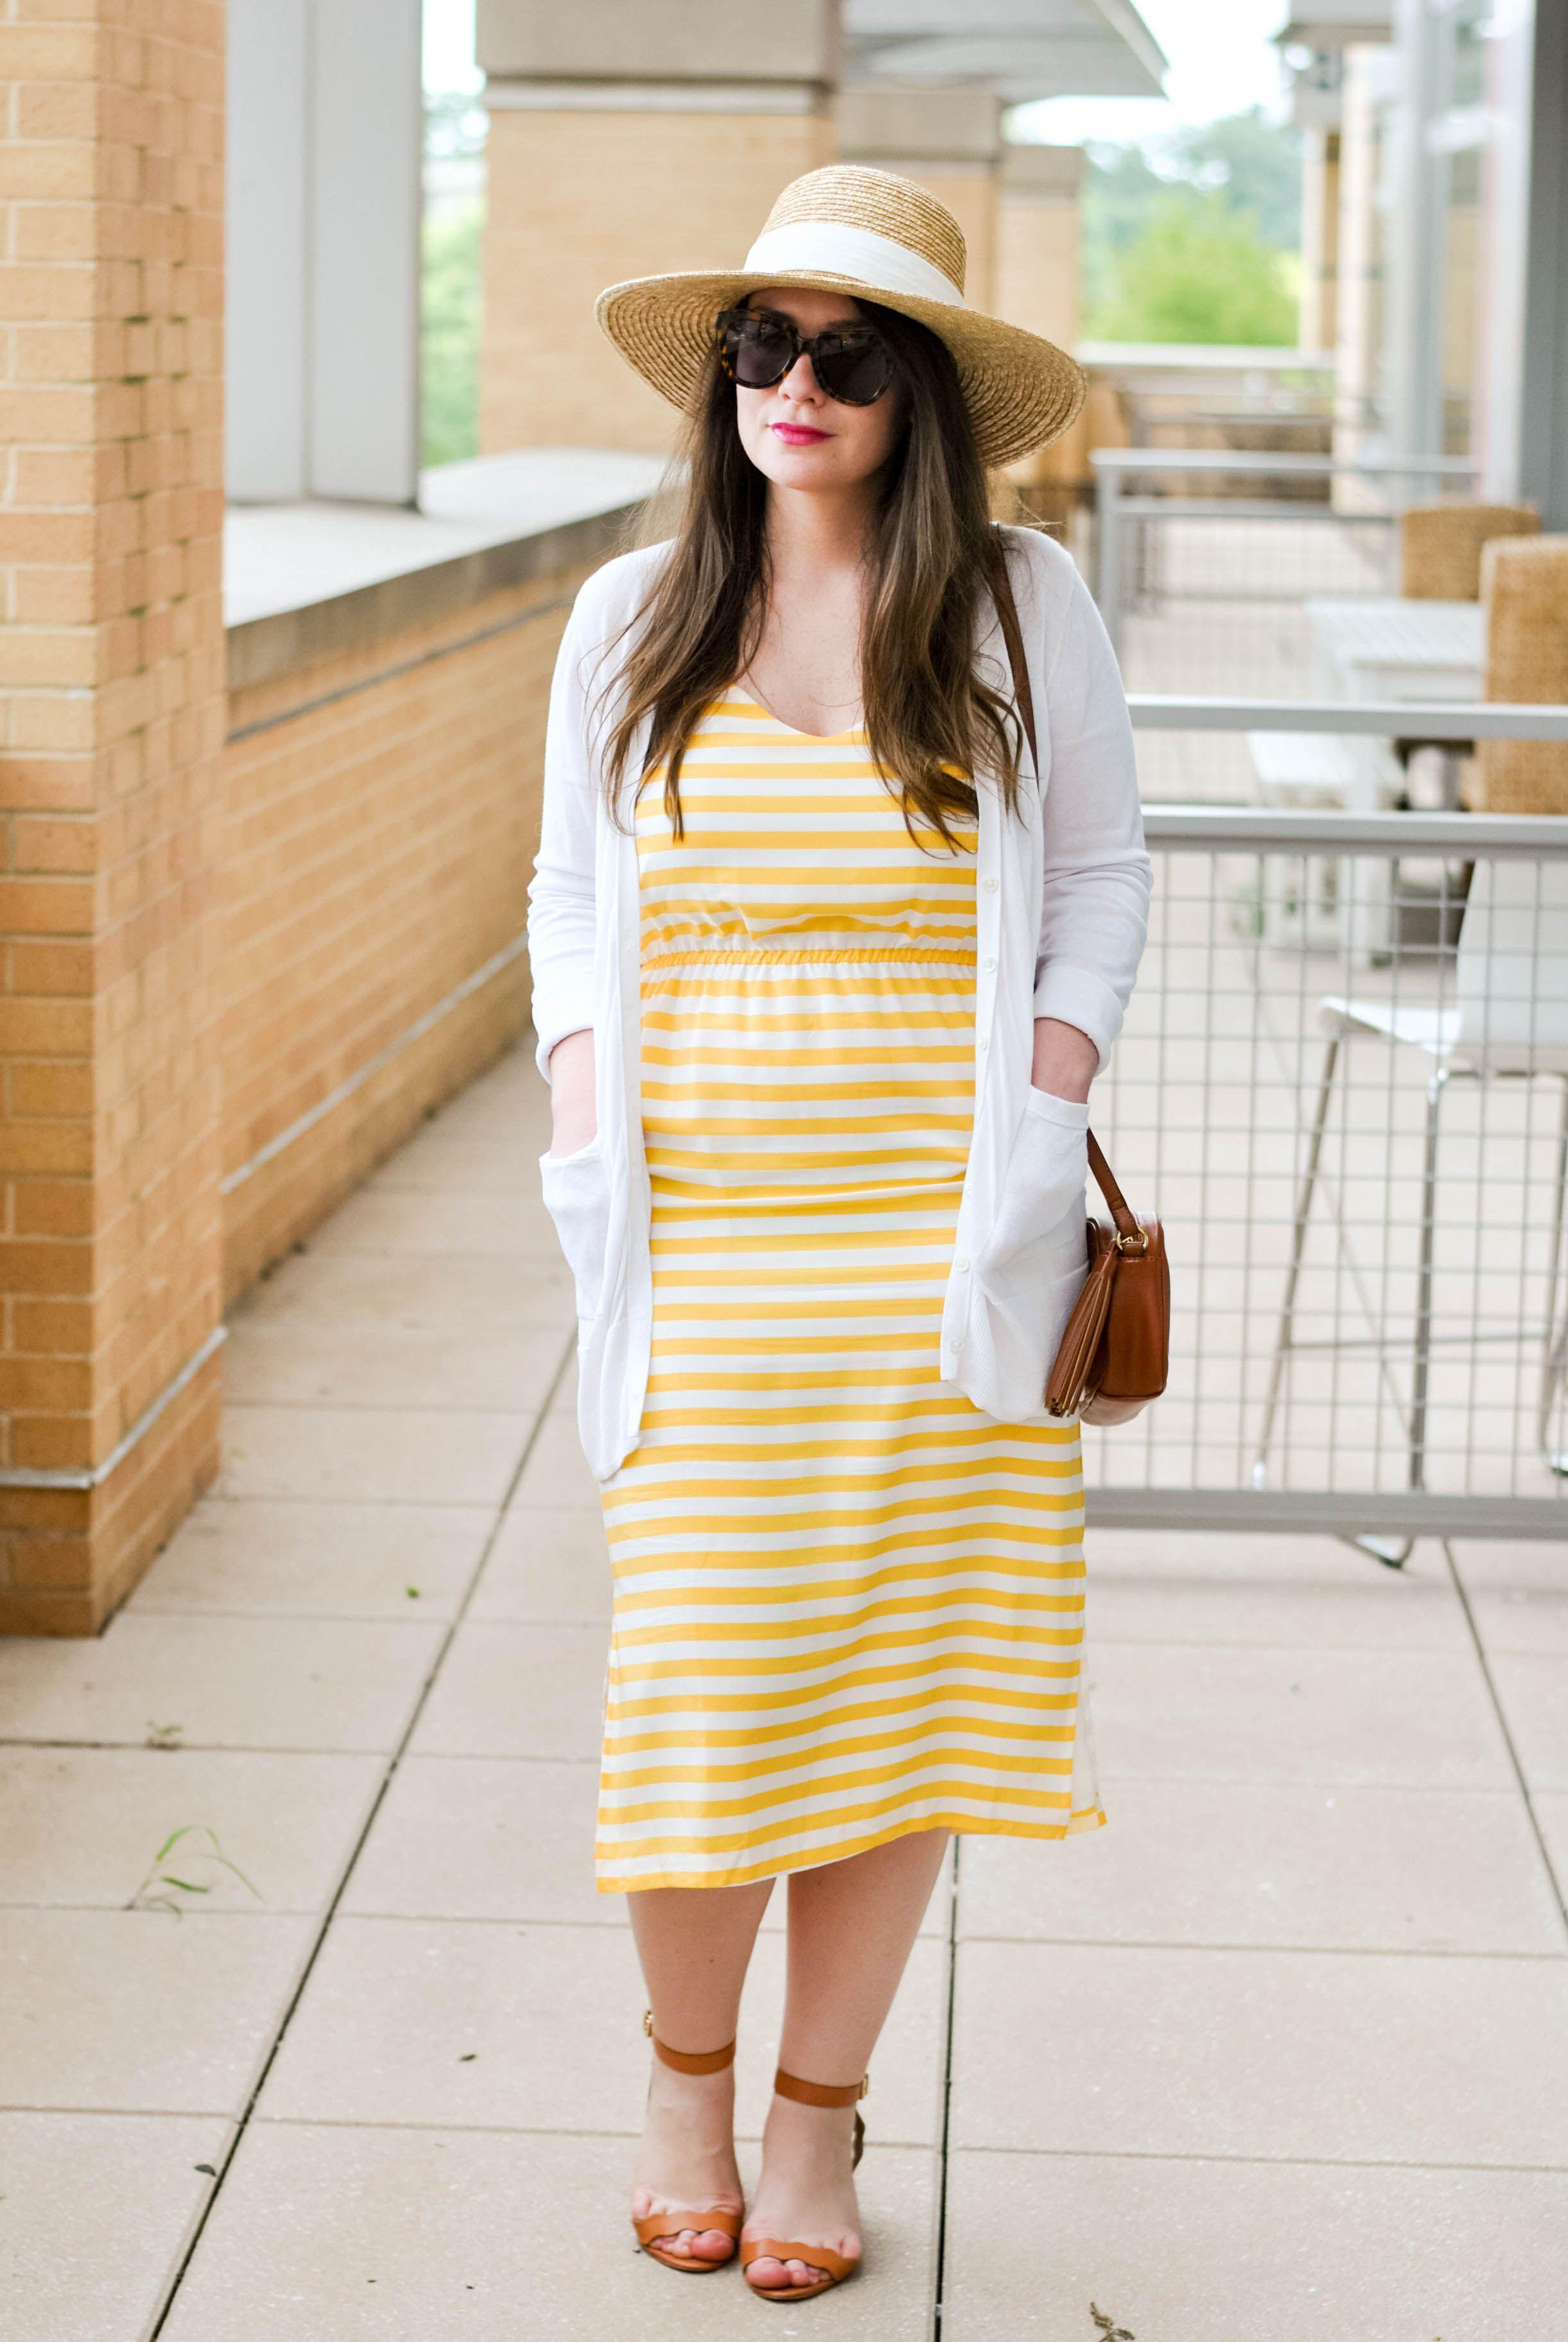 Yellow Dress White Cardigan Straw Hat Maxi Skirt Style Fashion Weather Wear [ 3652 x 2445 Pixel ]